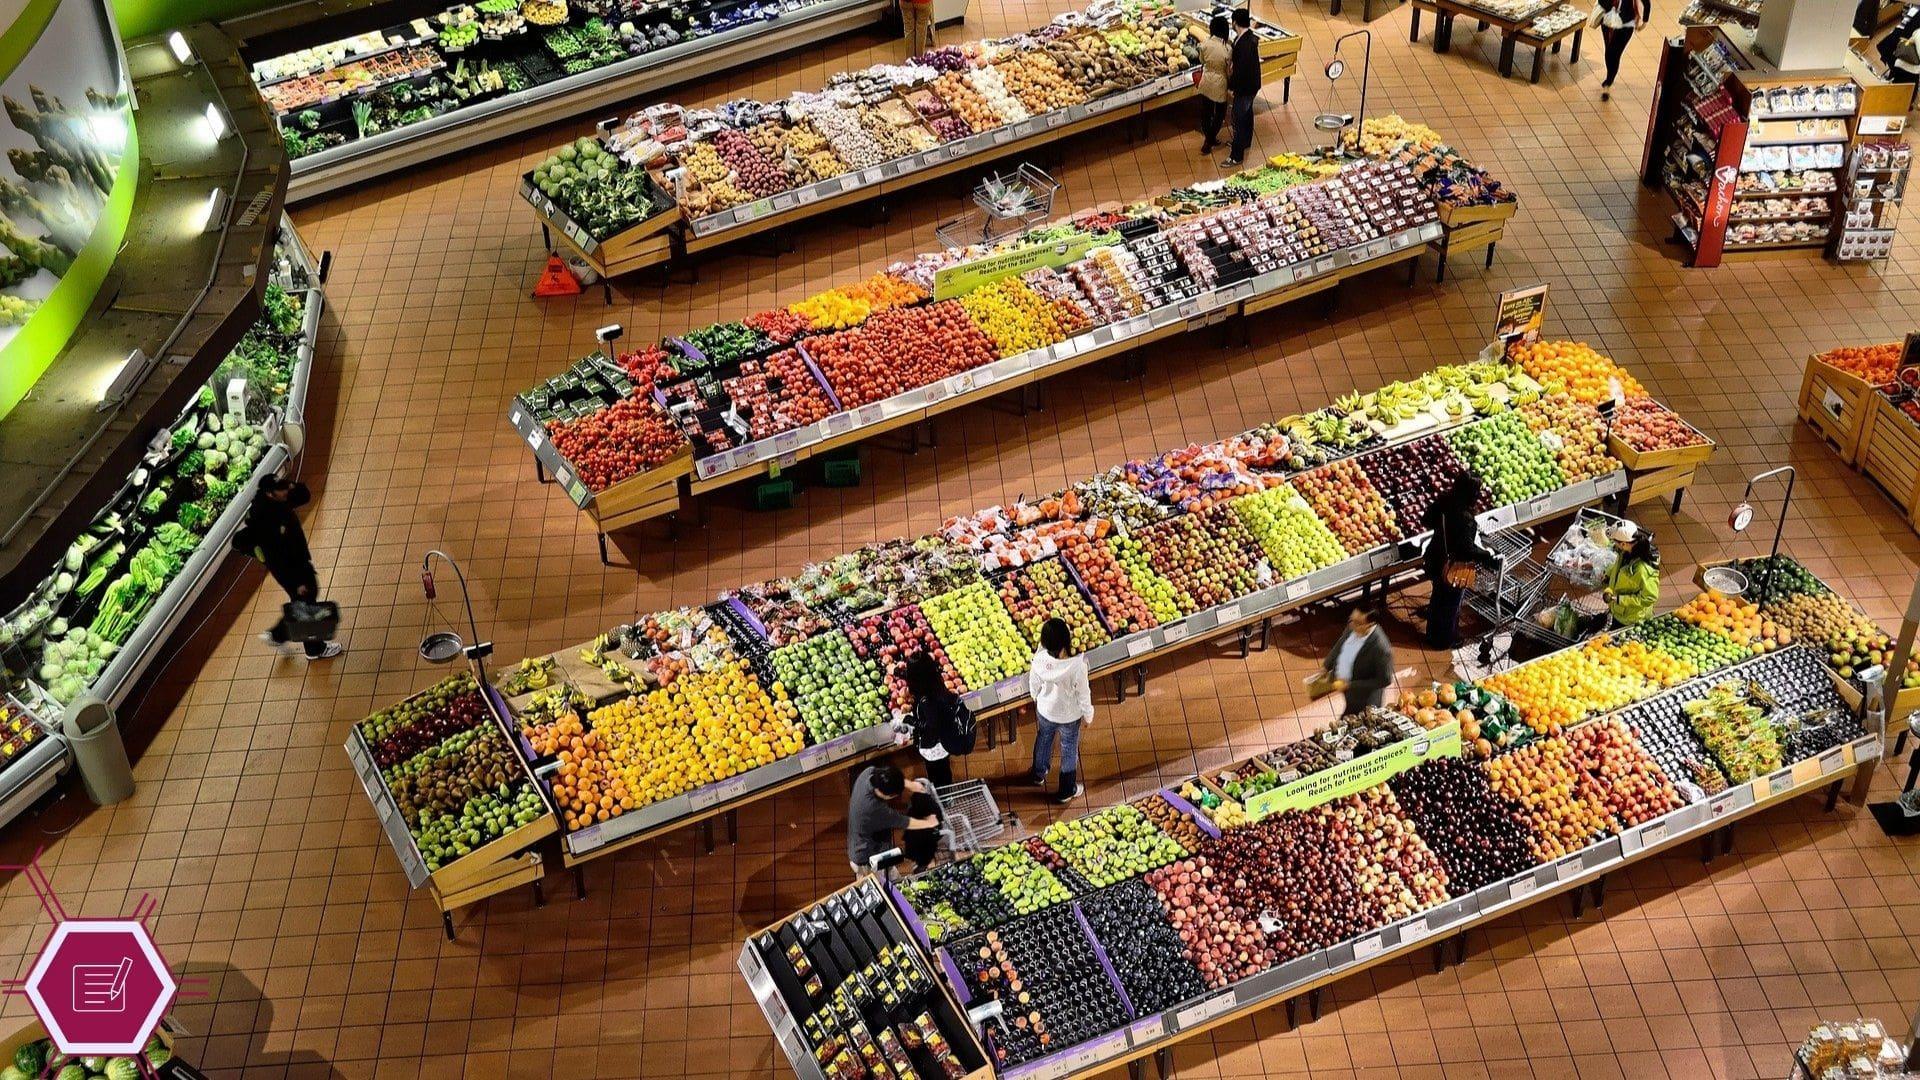 Antifragilitate in retail